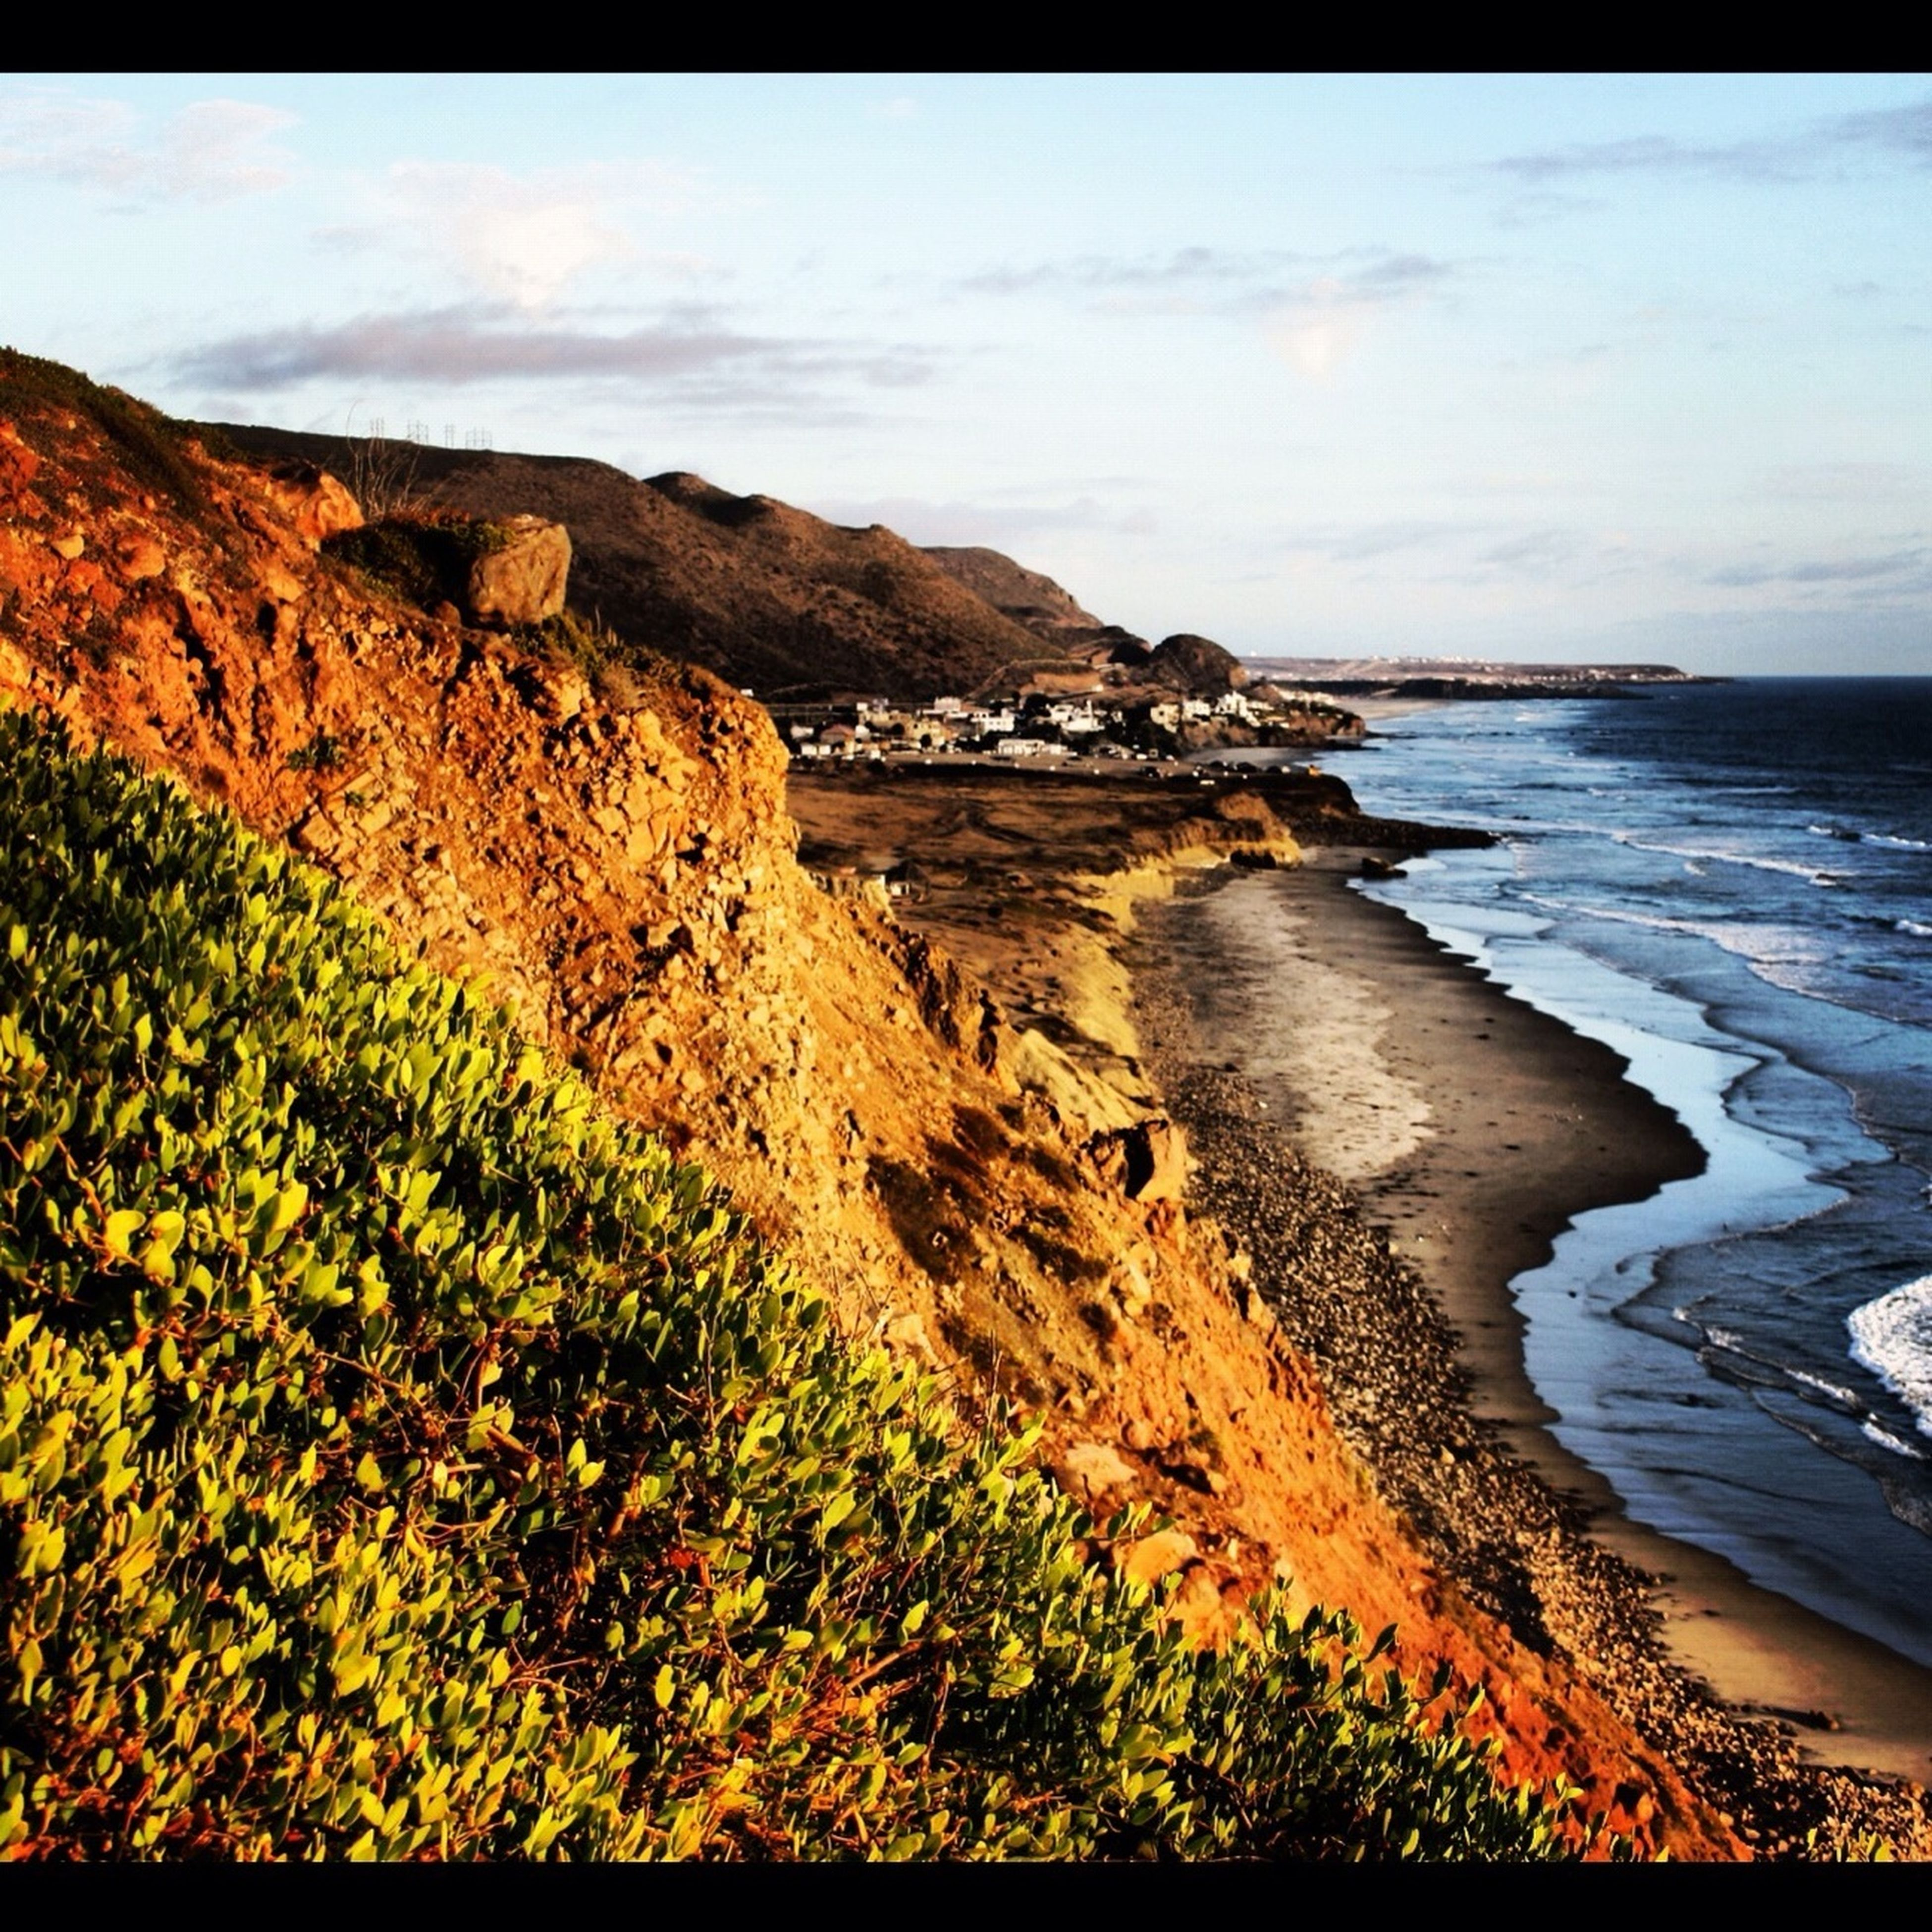 Nice hike at Torrey Pines state park/beach, San Diego, Ca. iPhone 4.